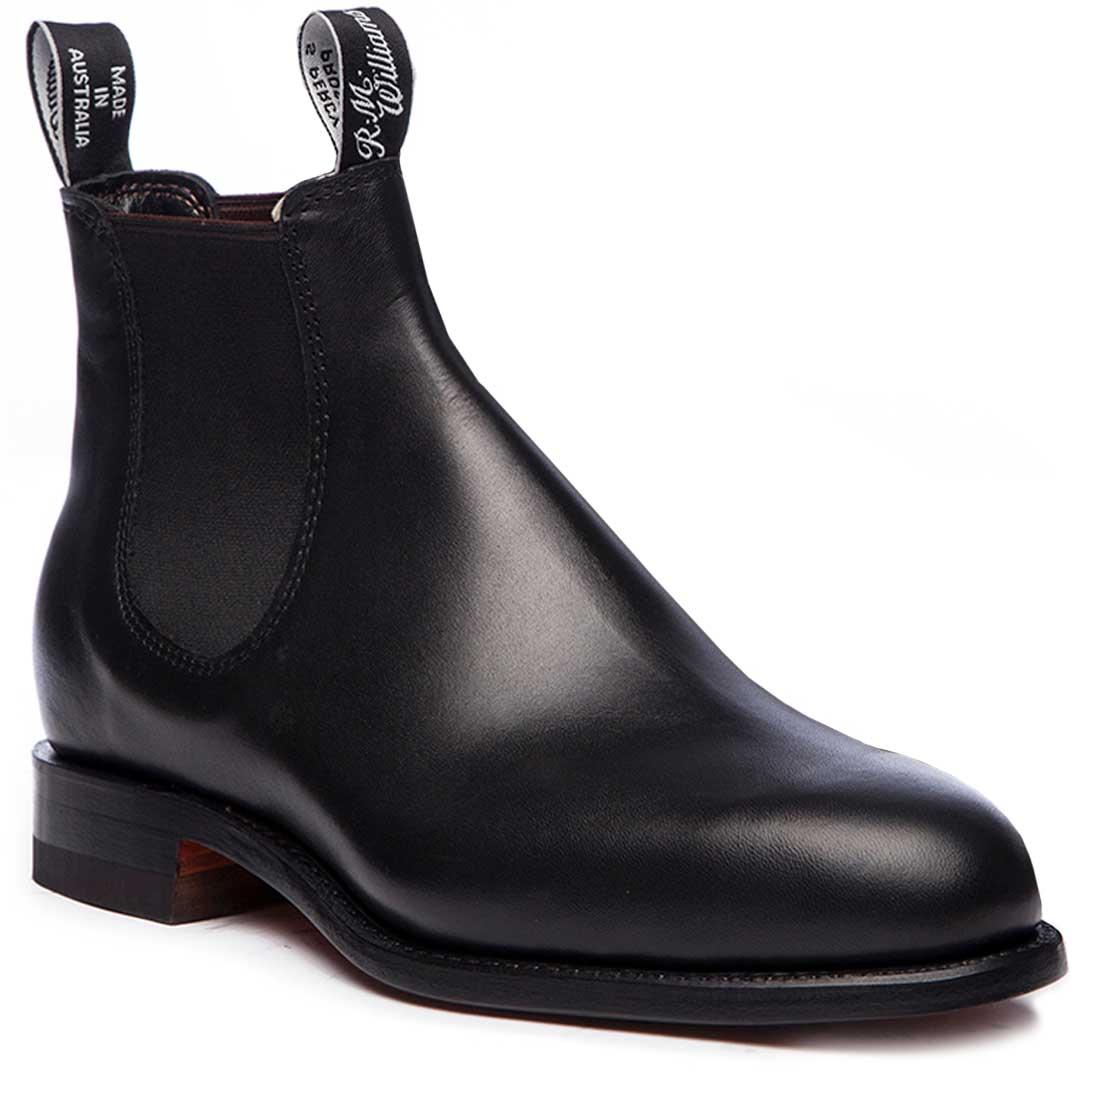 RM WILLIAMS Boots - Men's Classic